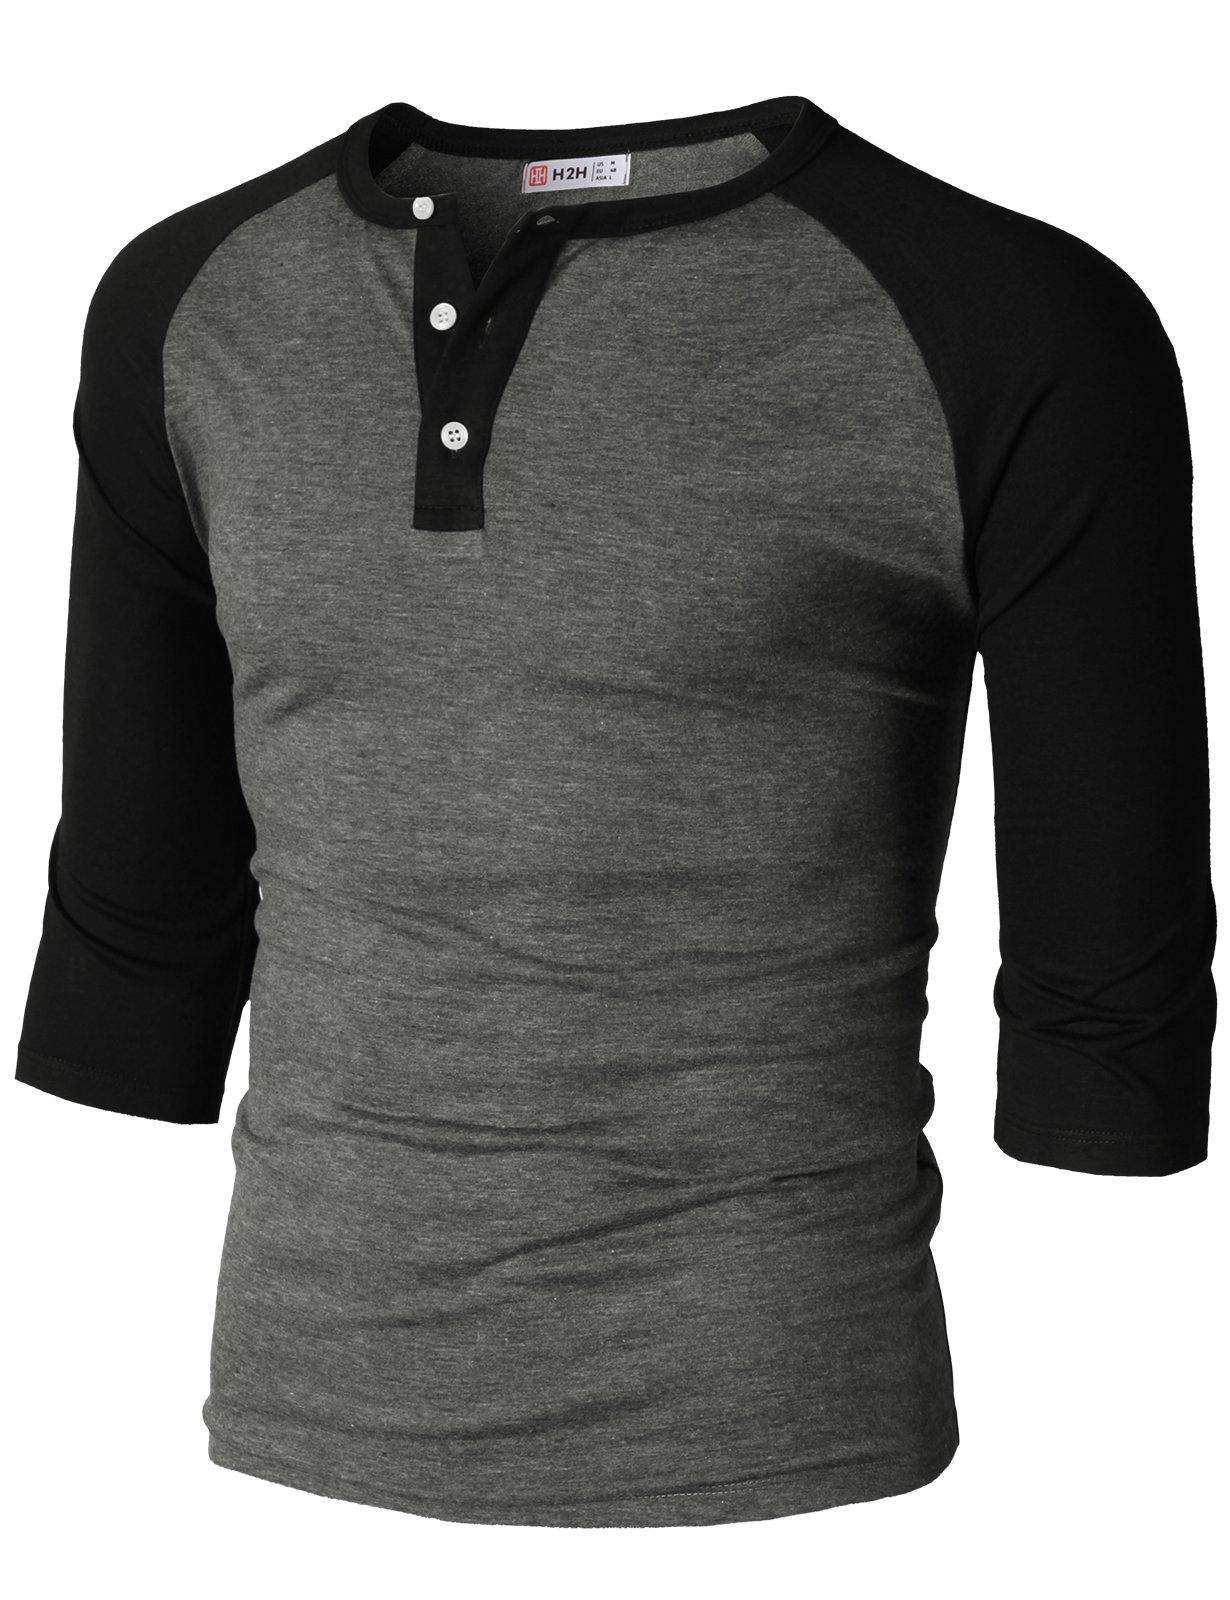 H2H Mens Casual Slim Fit Raglan Baseball Three-Quarter Sleeve Henley T-Shirts HeatherGray US L/Asia XL (CMTTS0229)